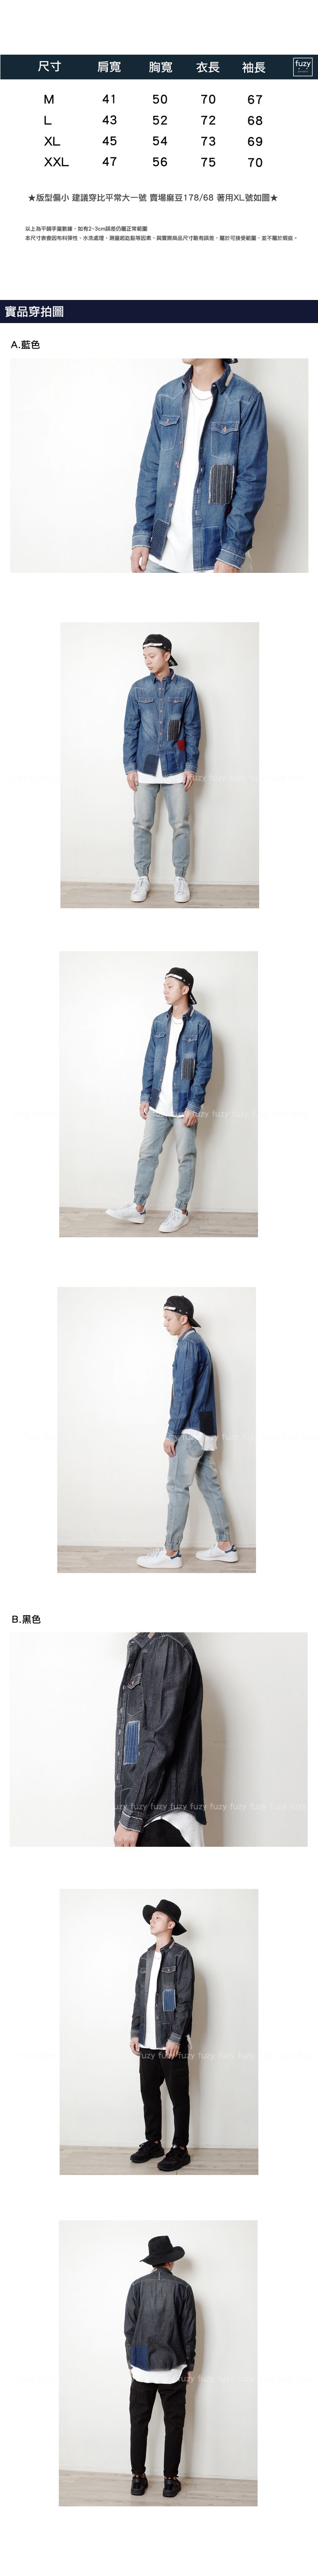 http://s7.sinaimg.cn/mw690/006ZoTFUzy7hXh2qPZQ36&690_* 福记 select shop * - ezship脸书店 :【fuzy】早鸟